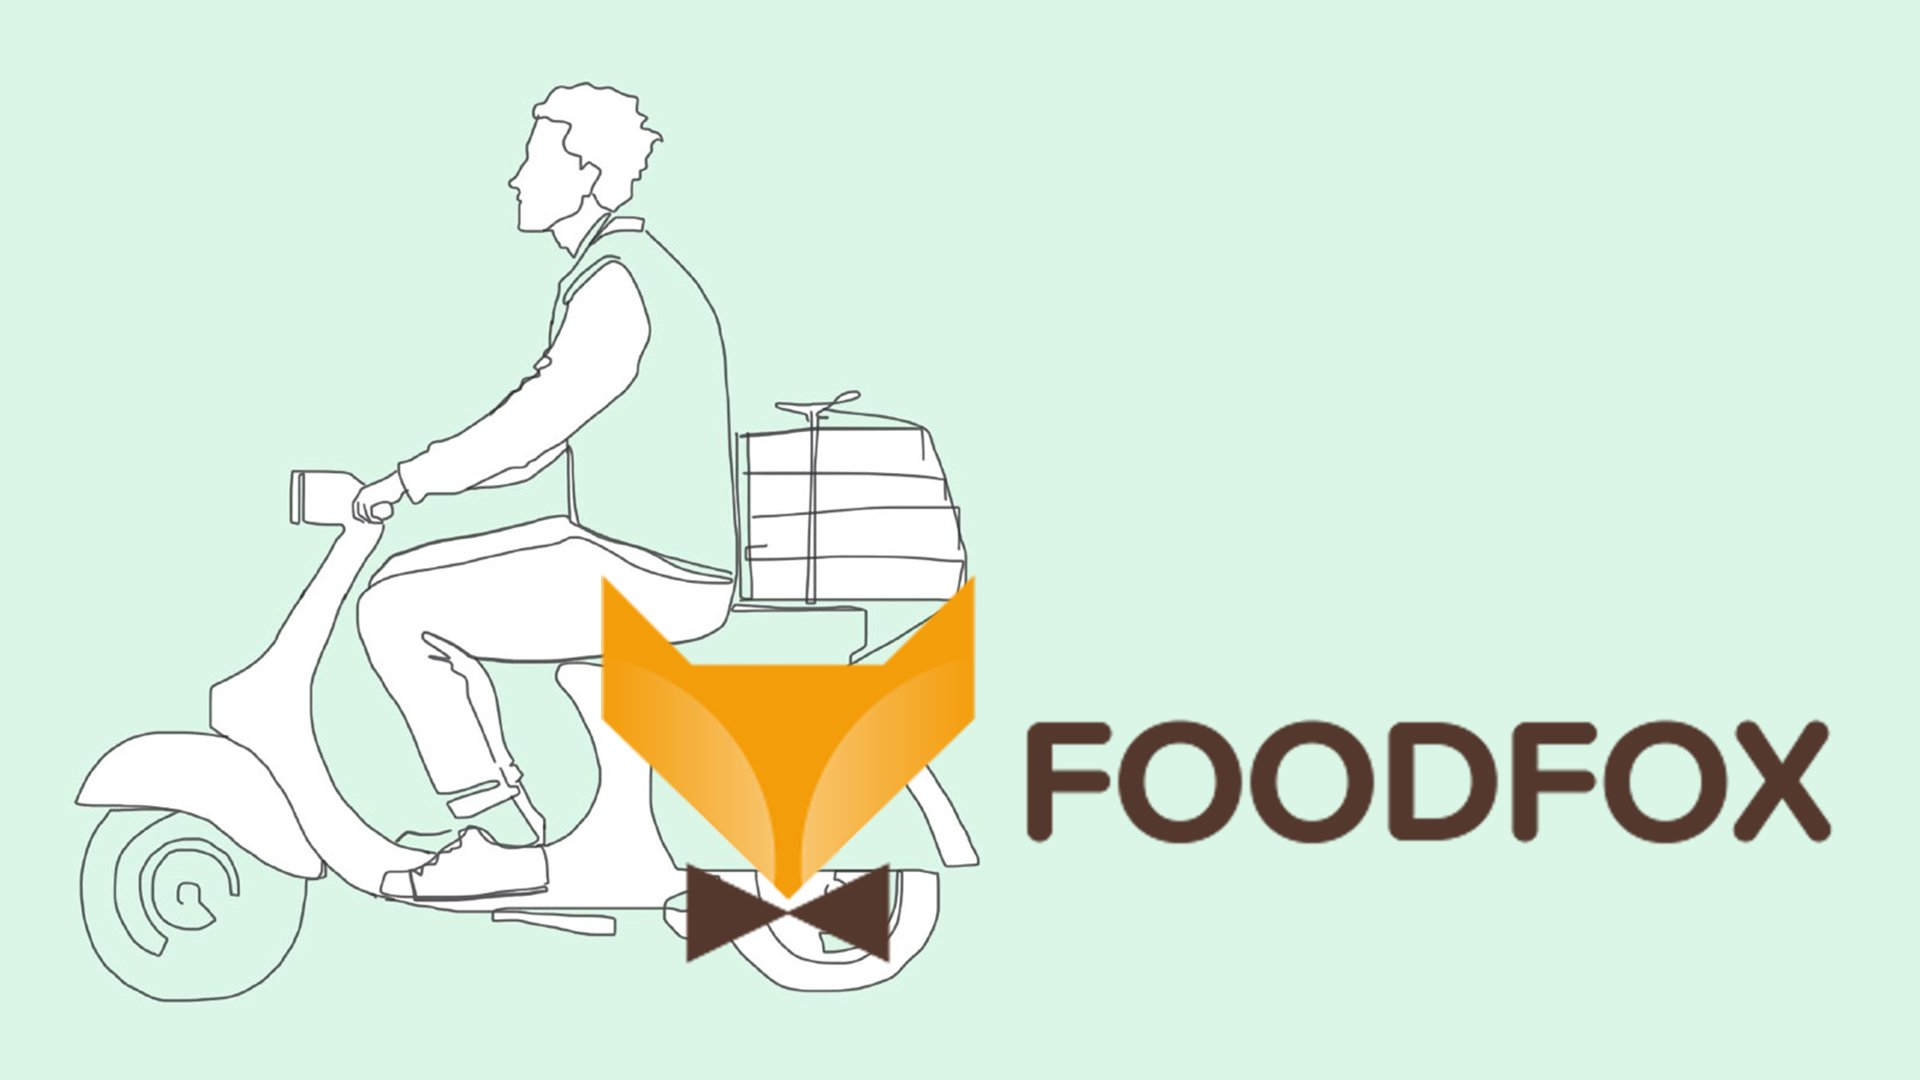 Foodfox Яндекс